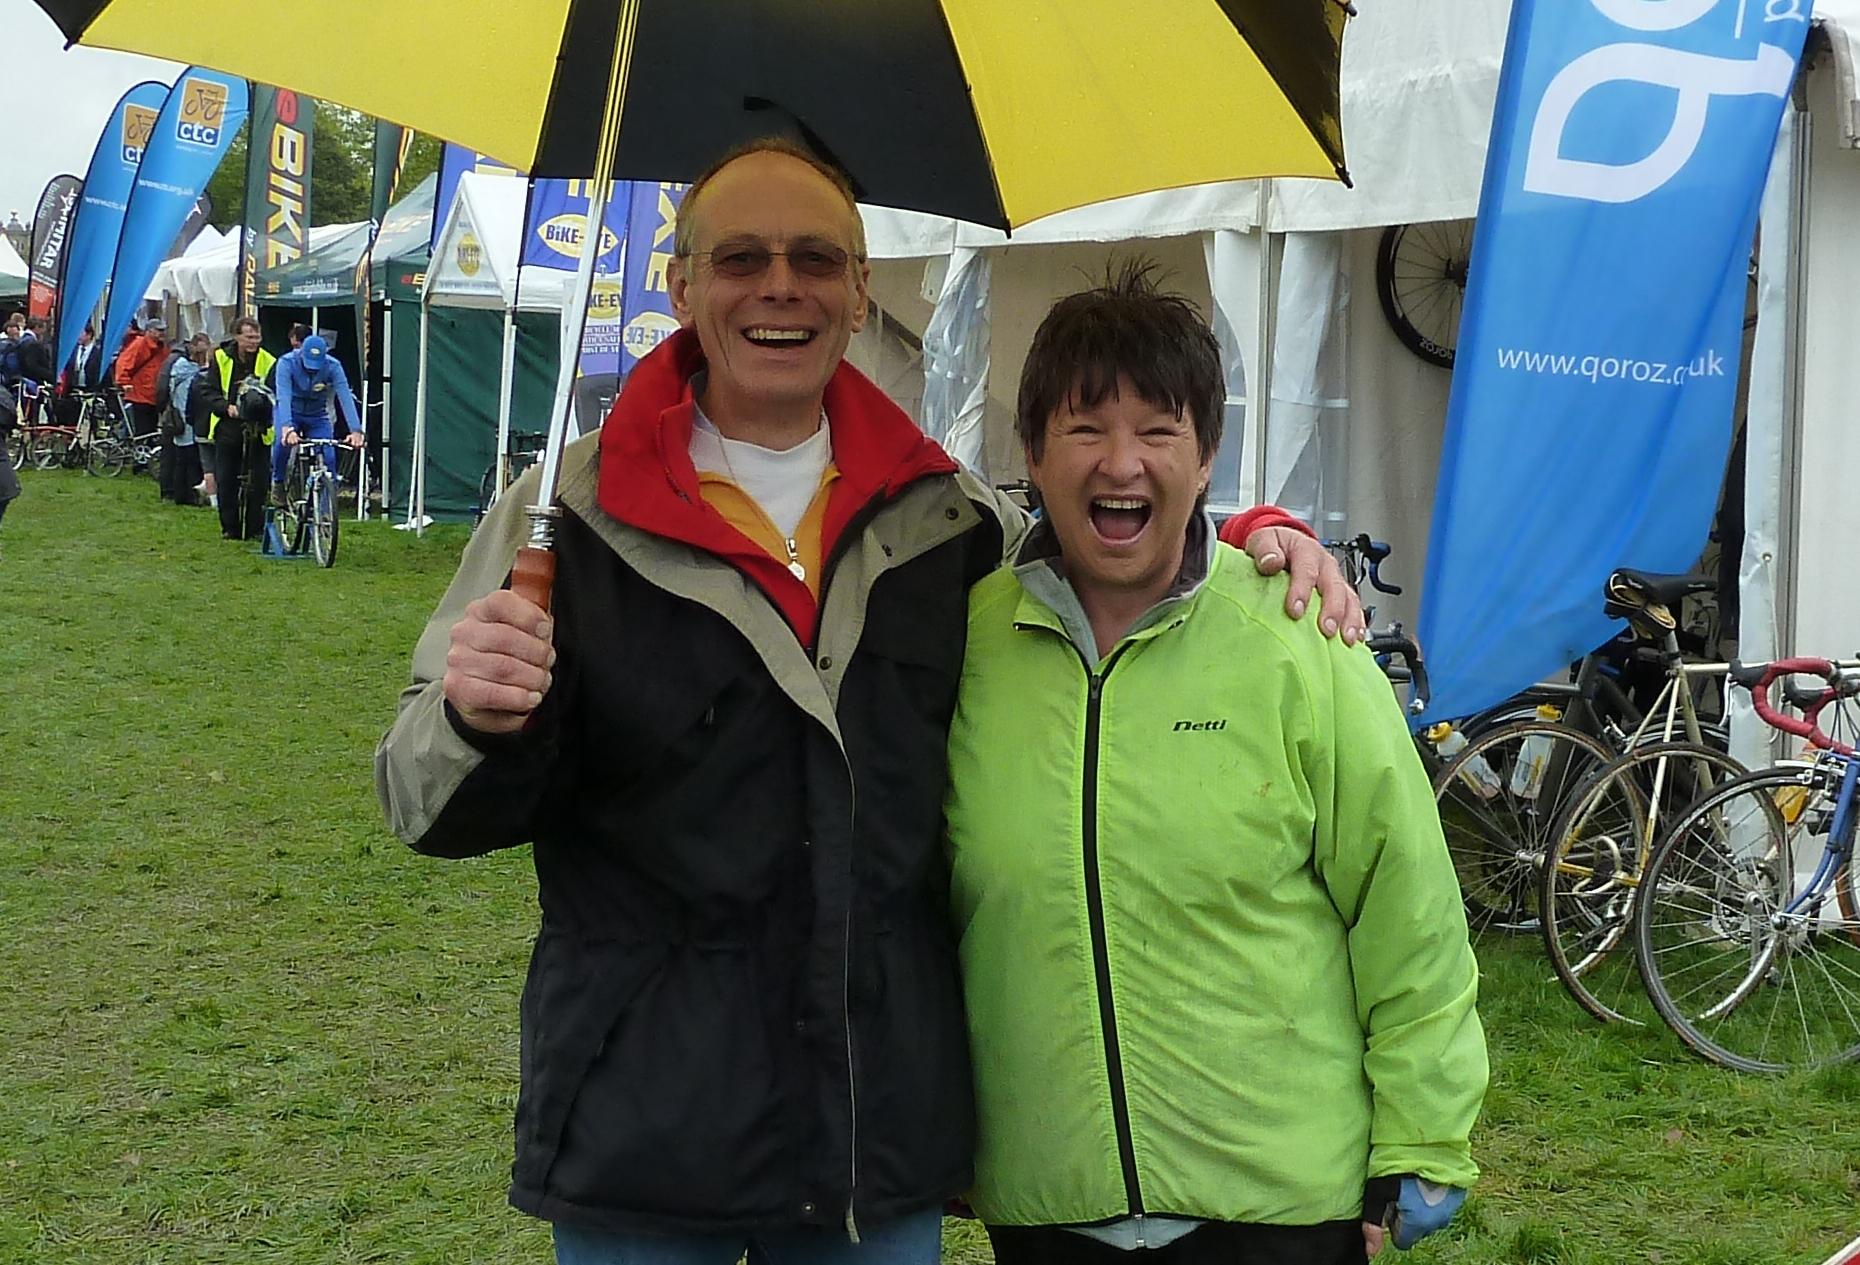 A 1 Geoff Booker & Caroline Nye